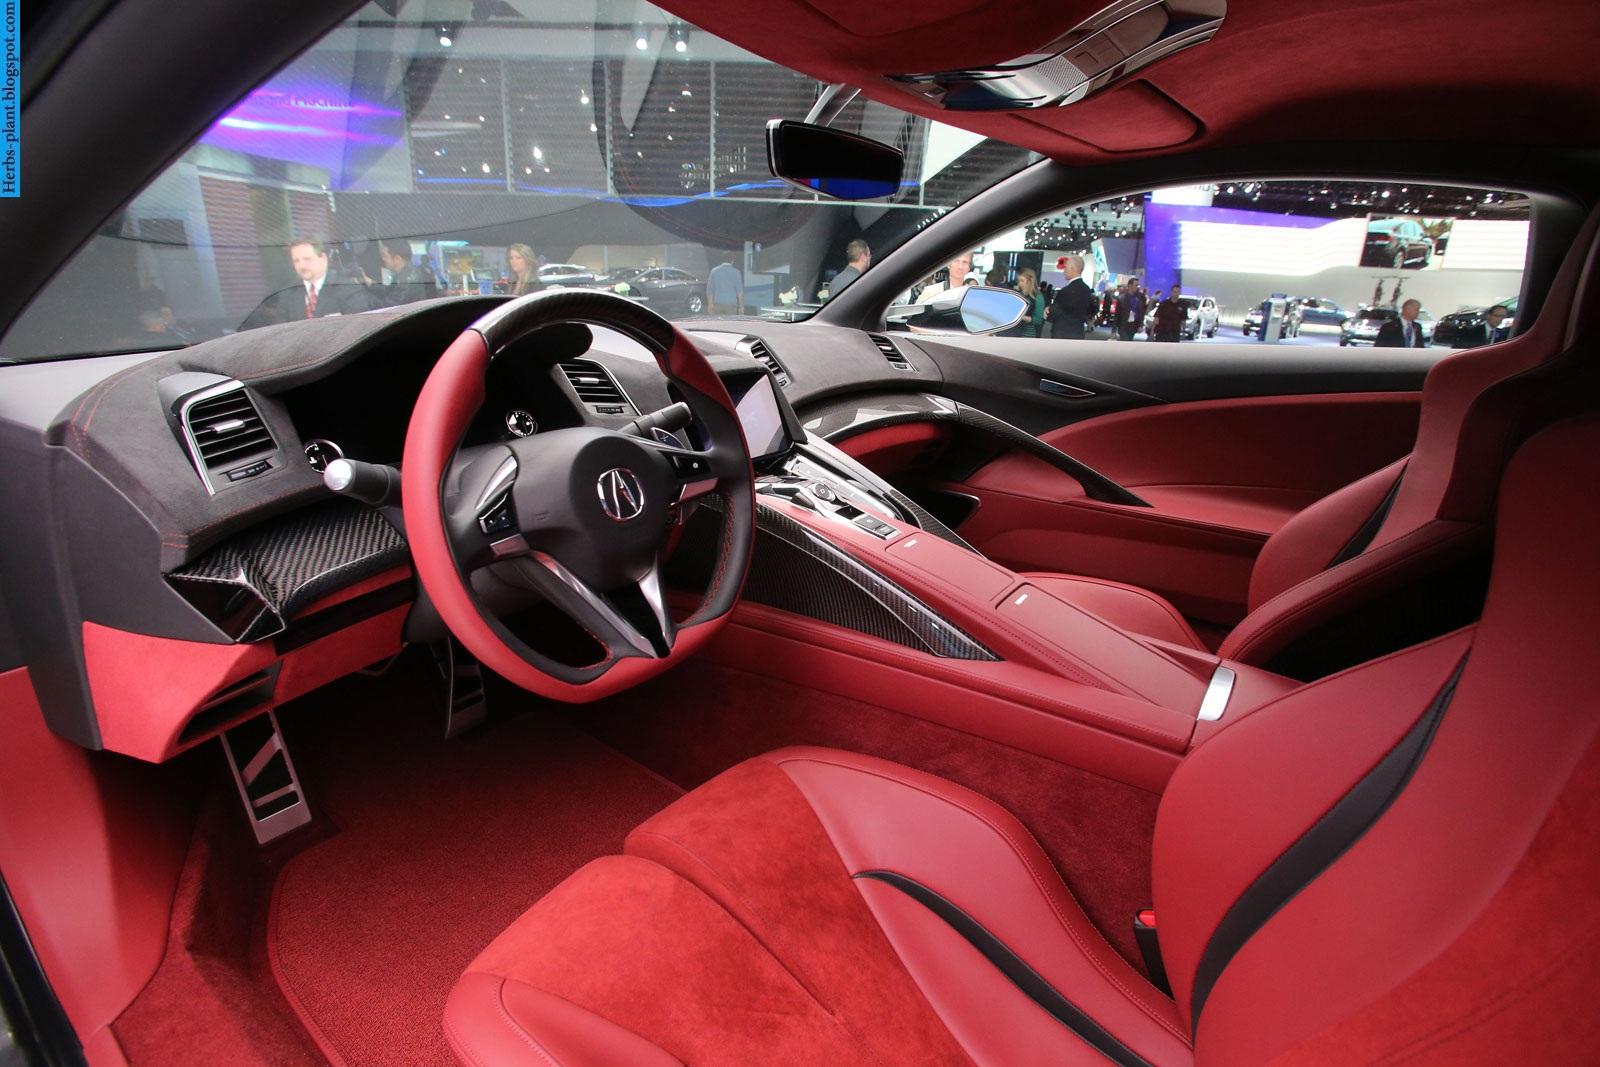 Acura nsx car 2013 interior - صور سيارة اكورا ان اس اكس 2013 من الداخل